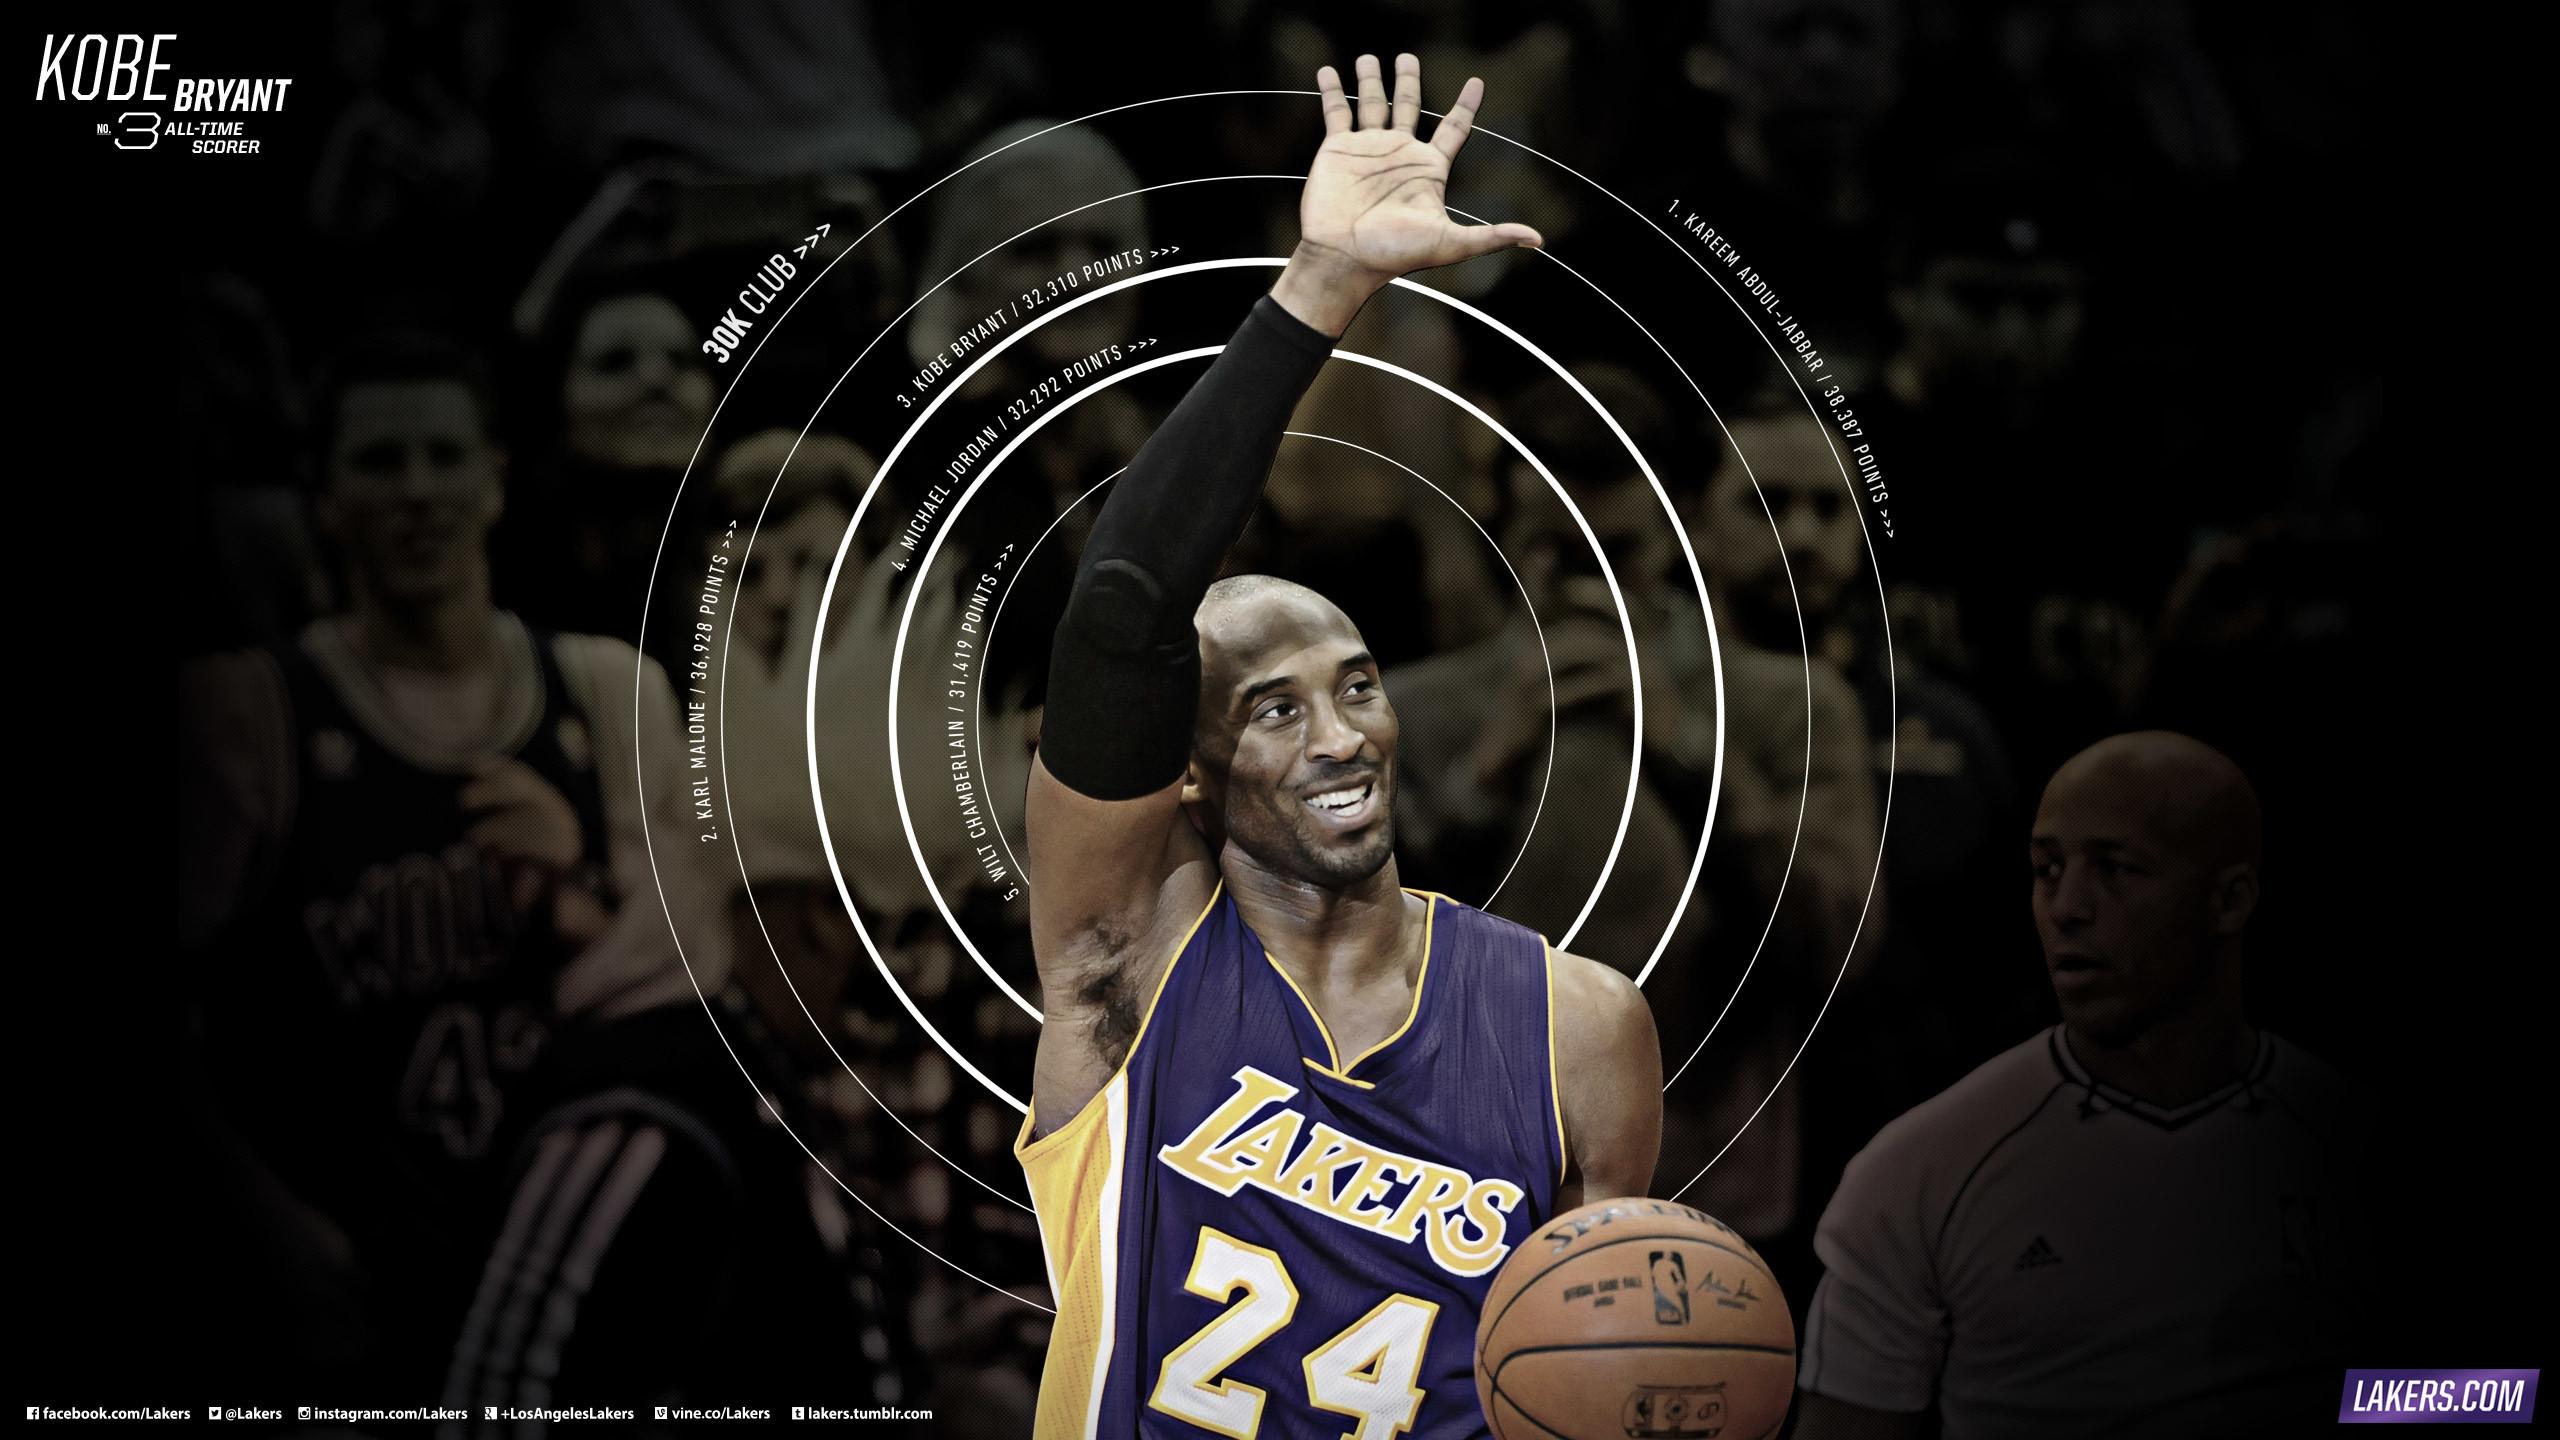 sale retailer 3e5bb b1f8d 2560x1440 Kobe Bryant Passes Michael Jordan